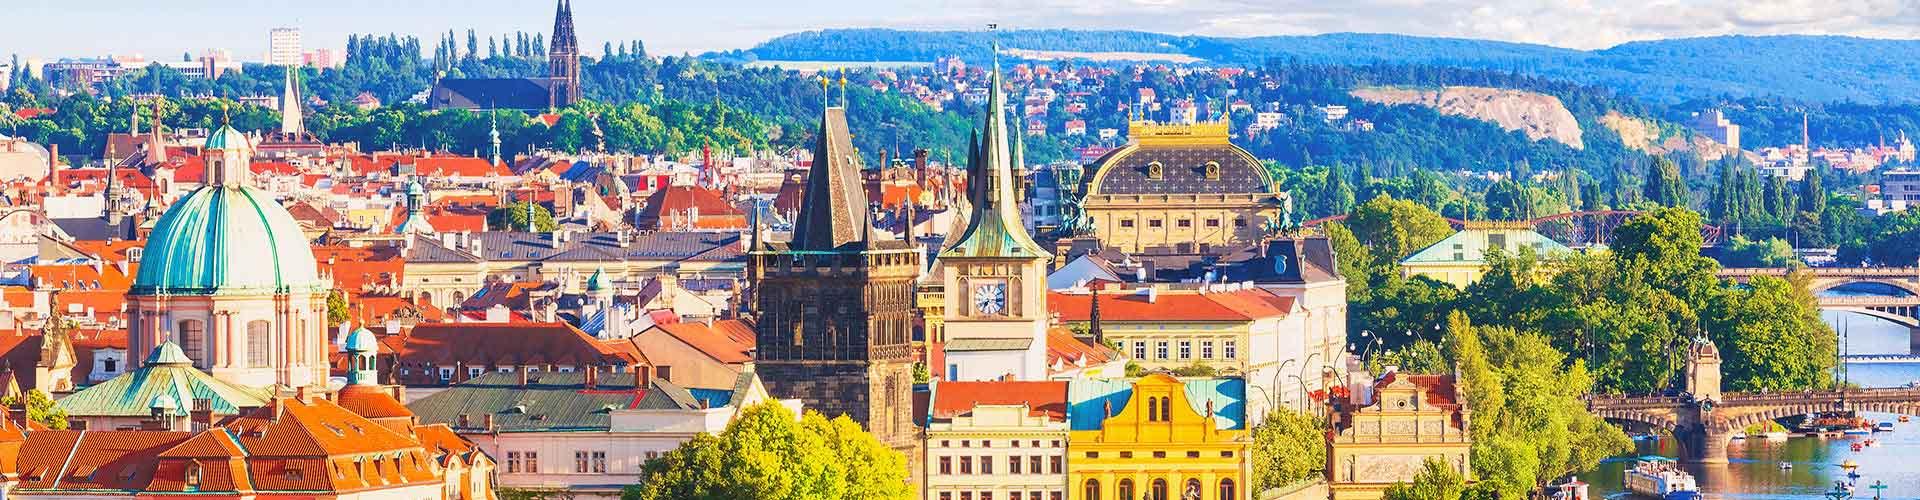 Praga – Ostelli nella zona  Liben. Mappe per Praga, Foto e Recensioni per ogni Ostello a Praga.